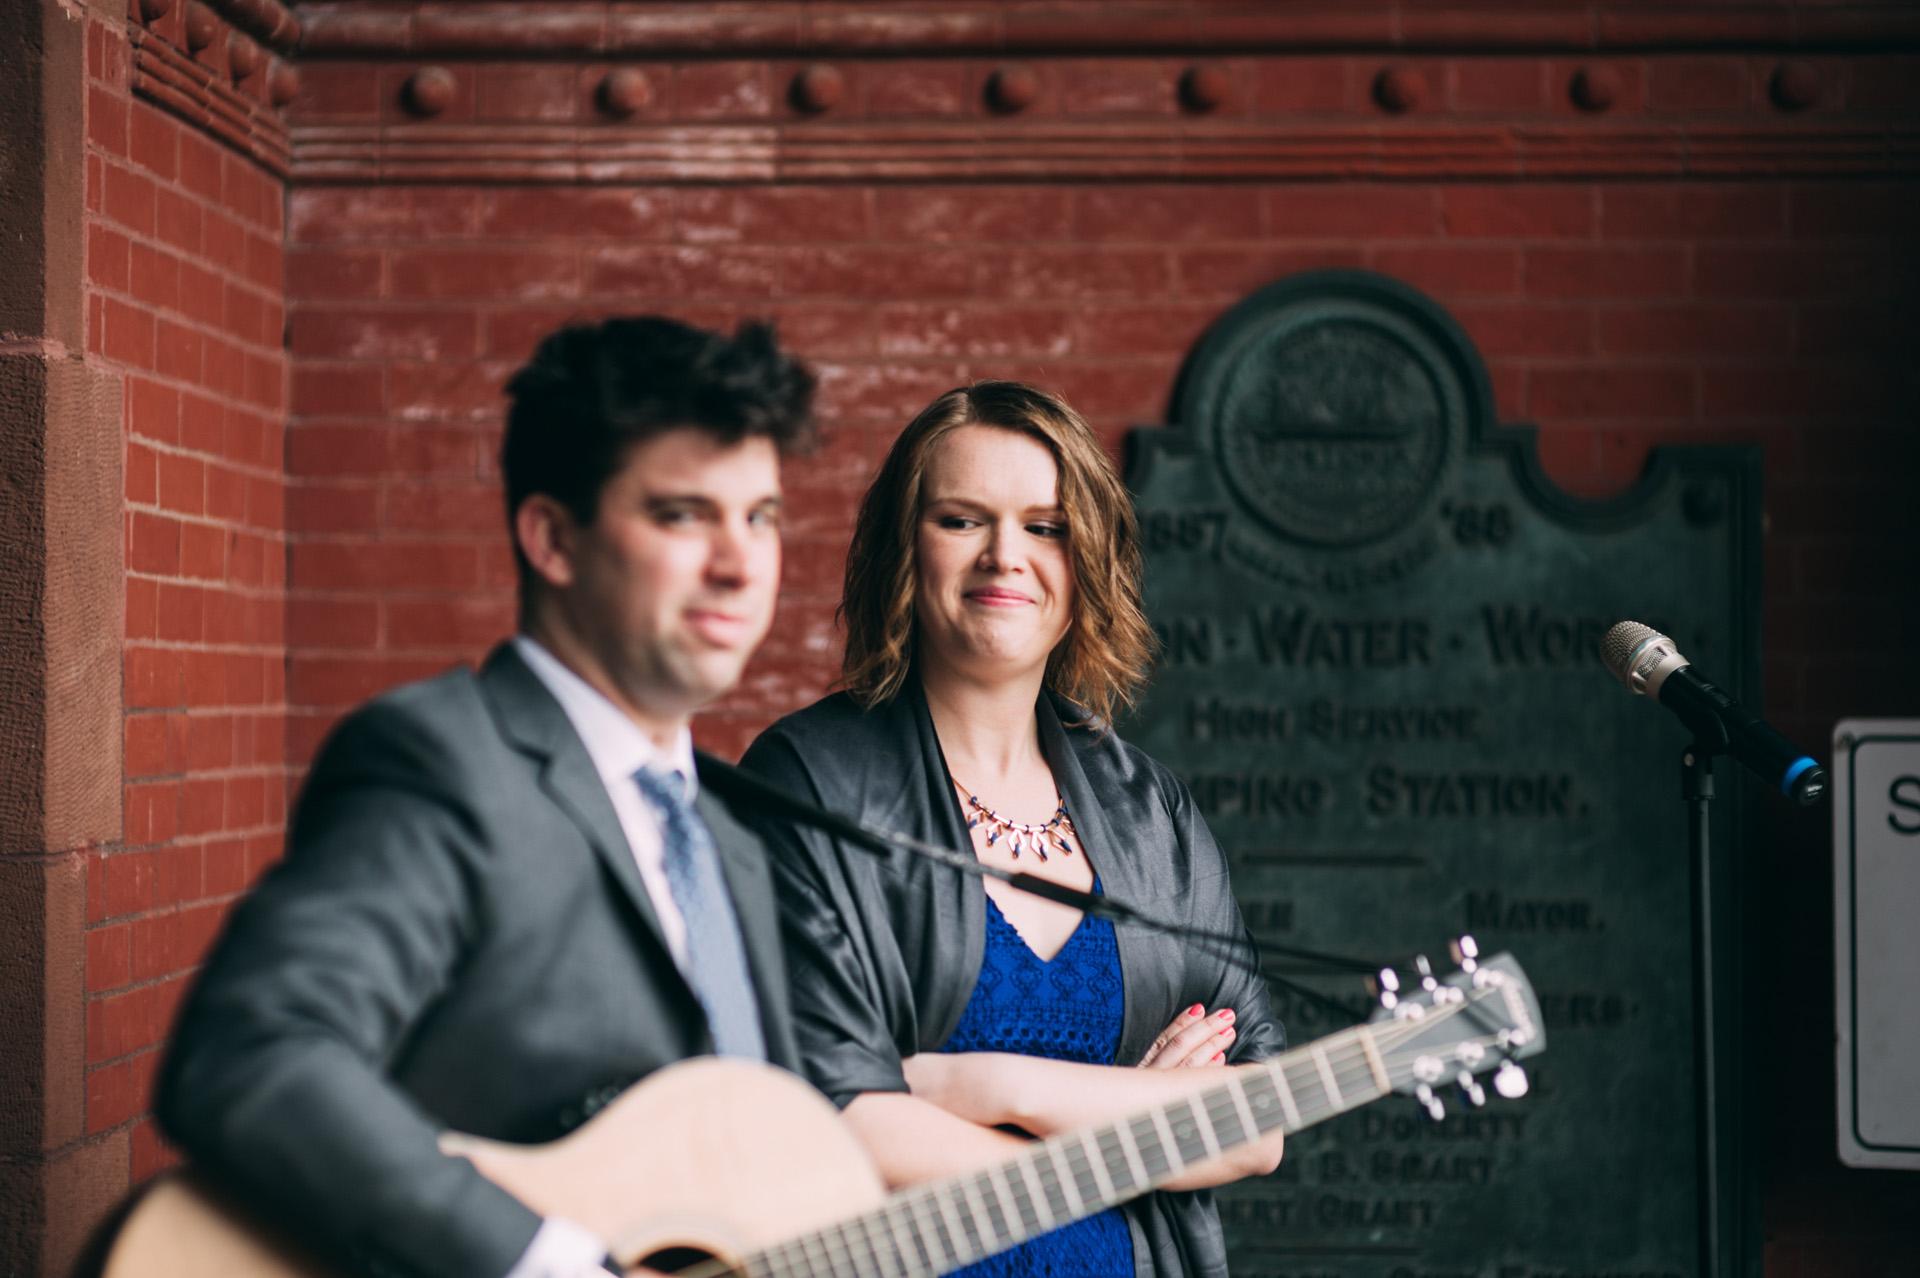 boston-waterworks-museum-wedding-29